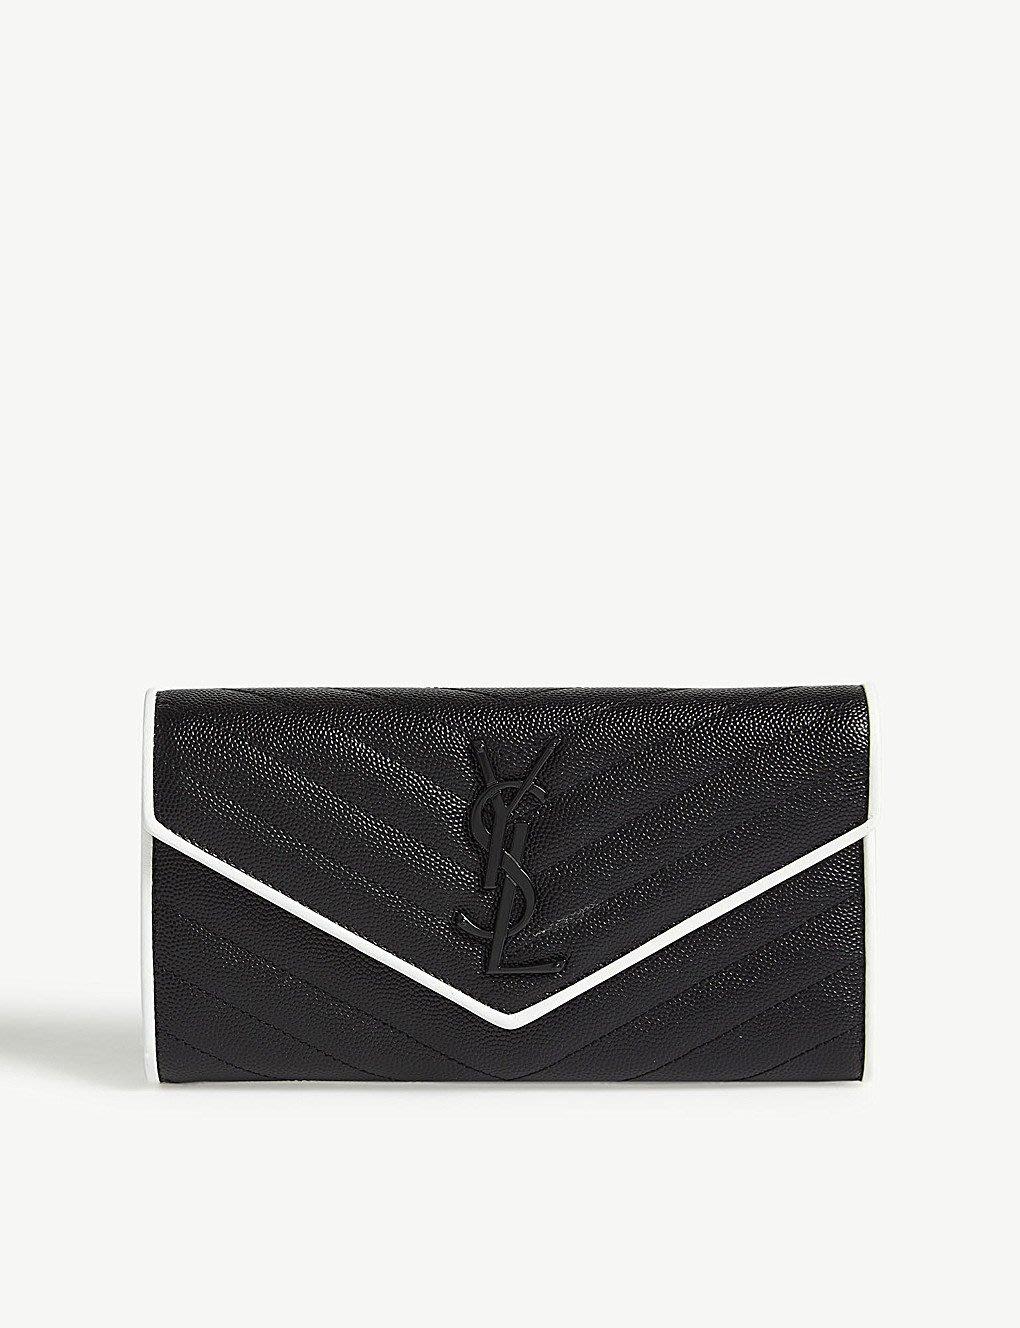 SAINT LAURENT Monogram quilted leather wallet 魚子醬紋 長夾